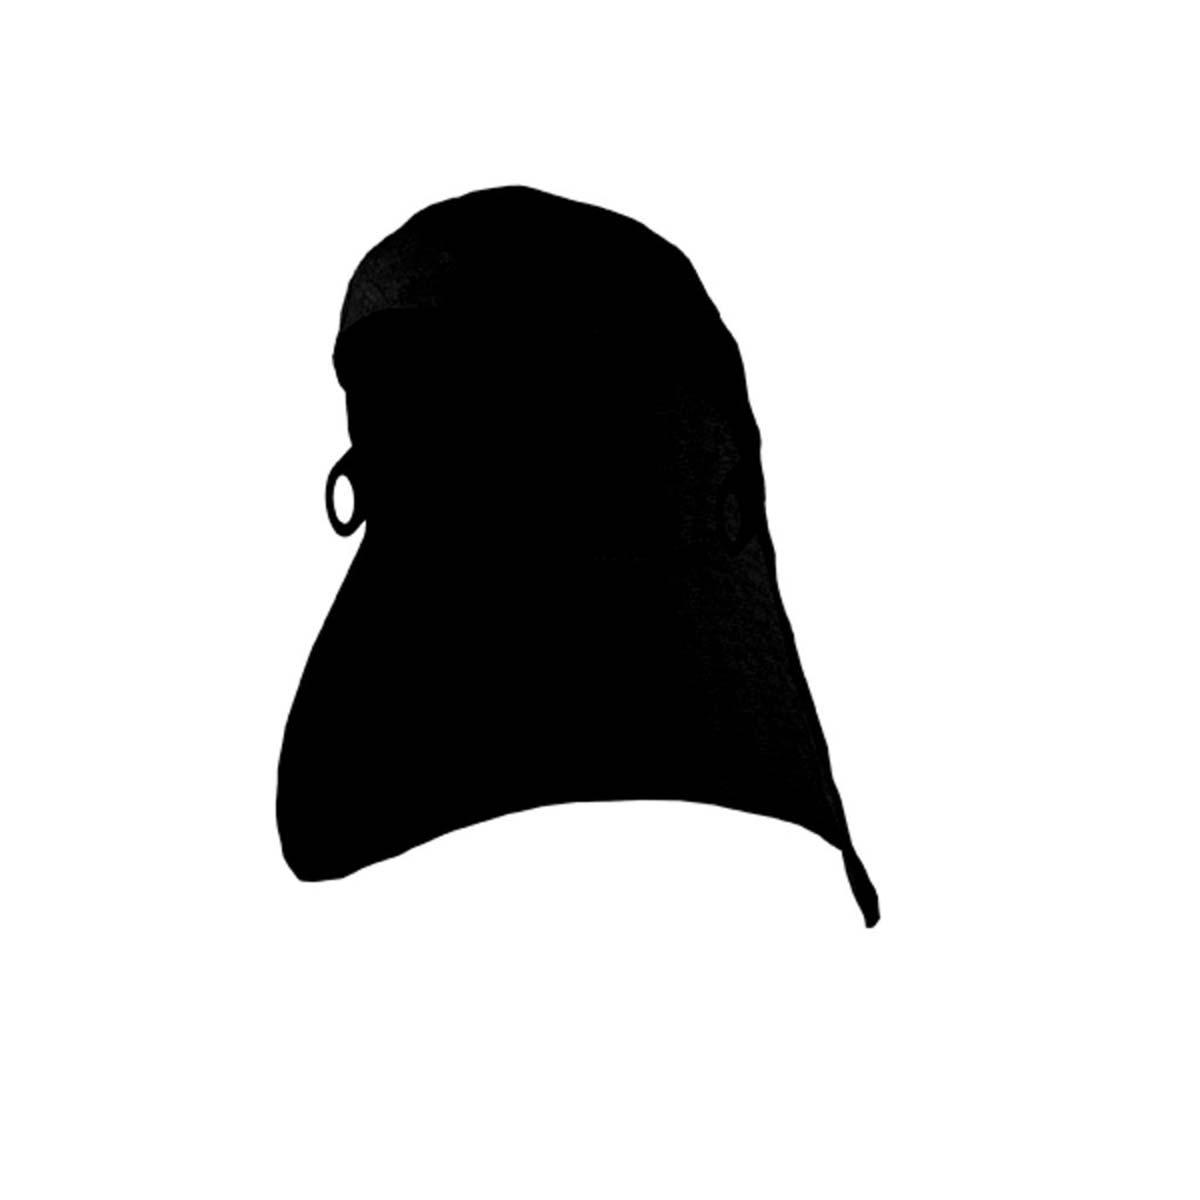 "3Mâ""¢ Speedglasâ""¢ Welding Helmet Extended Headcover 9100 FX/ 9100 FX-Air 06-0700-82"